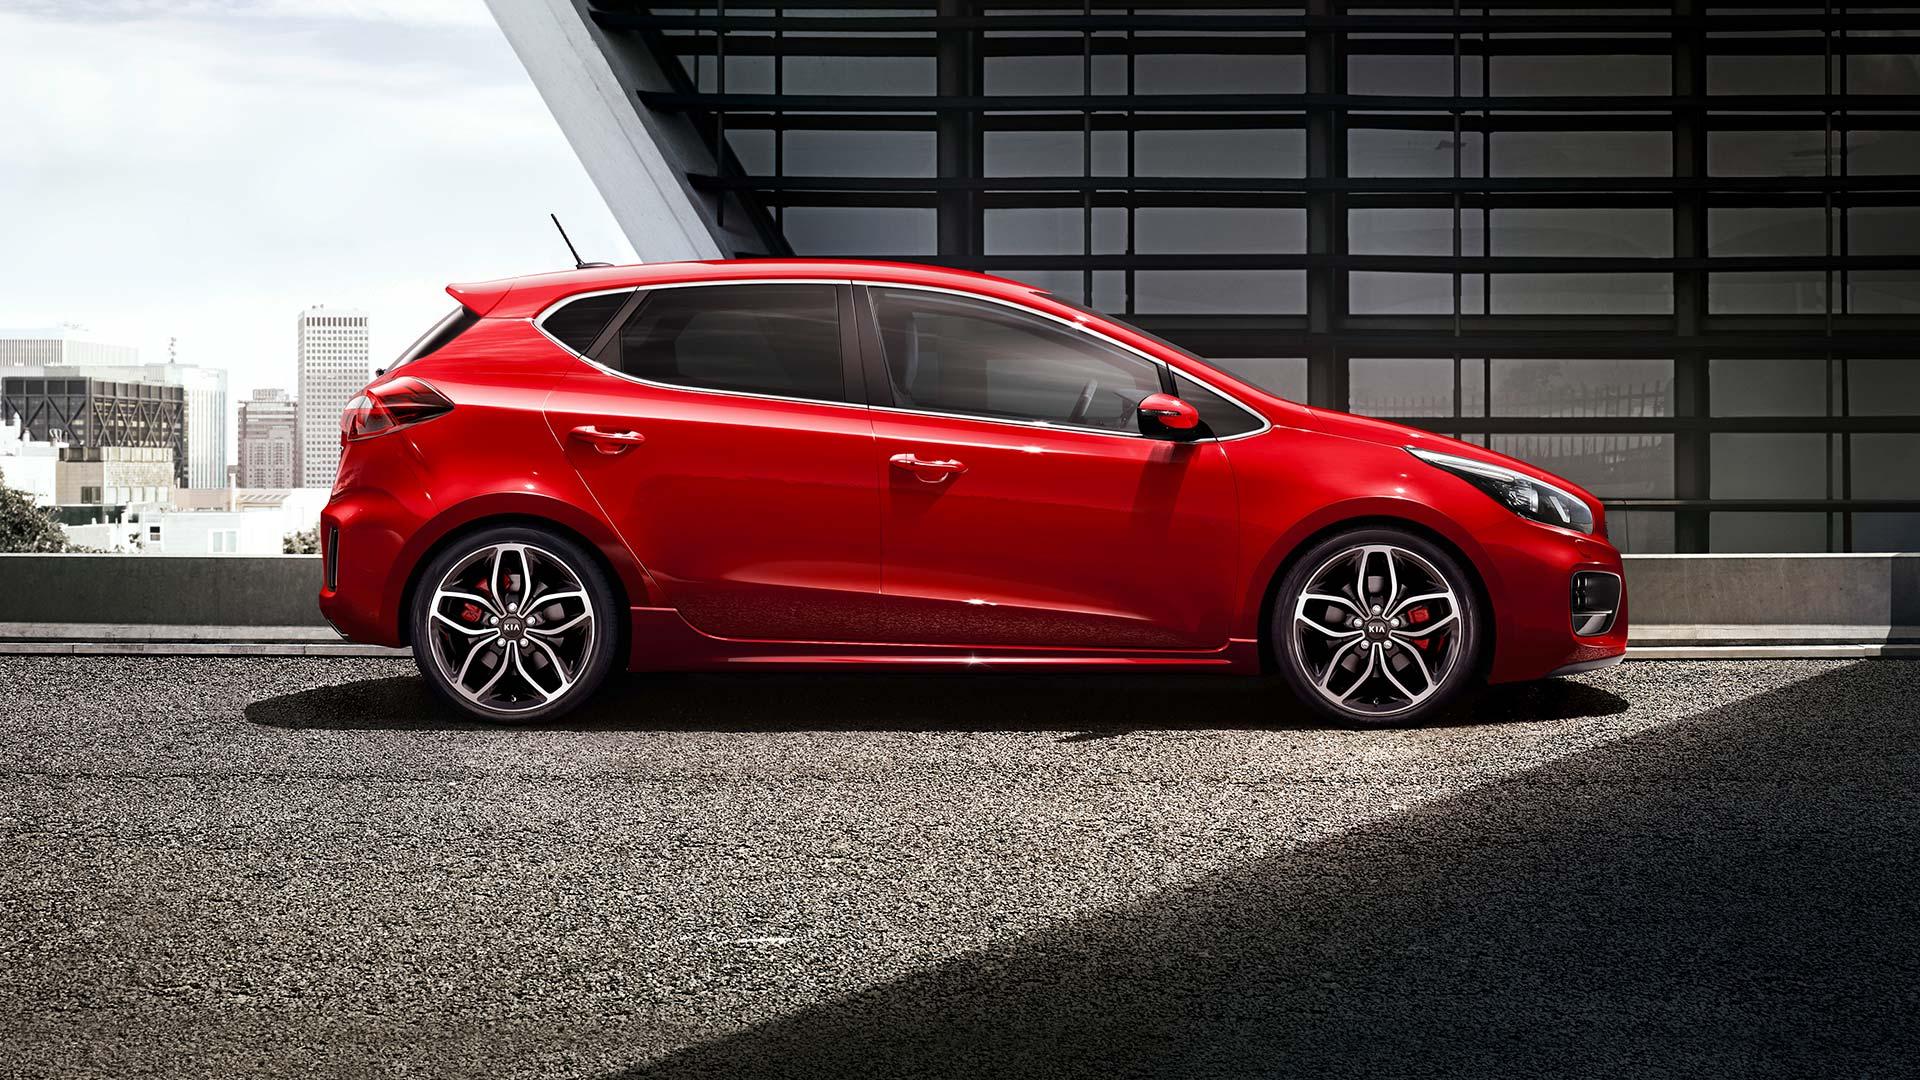 Kia Proceed Amp Ceed Gt Facelift Revealed The Korean Car Blog